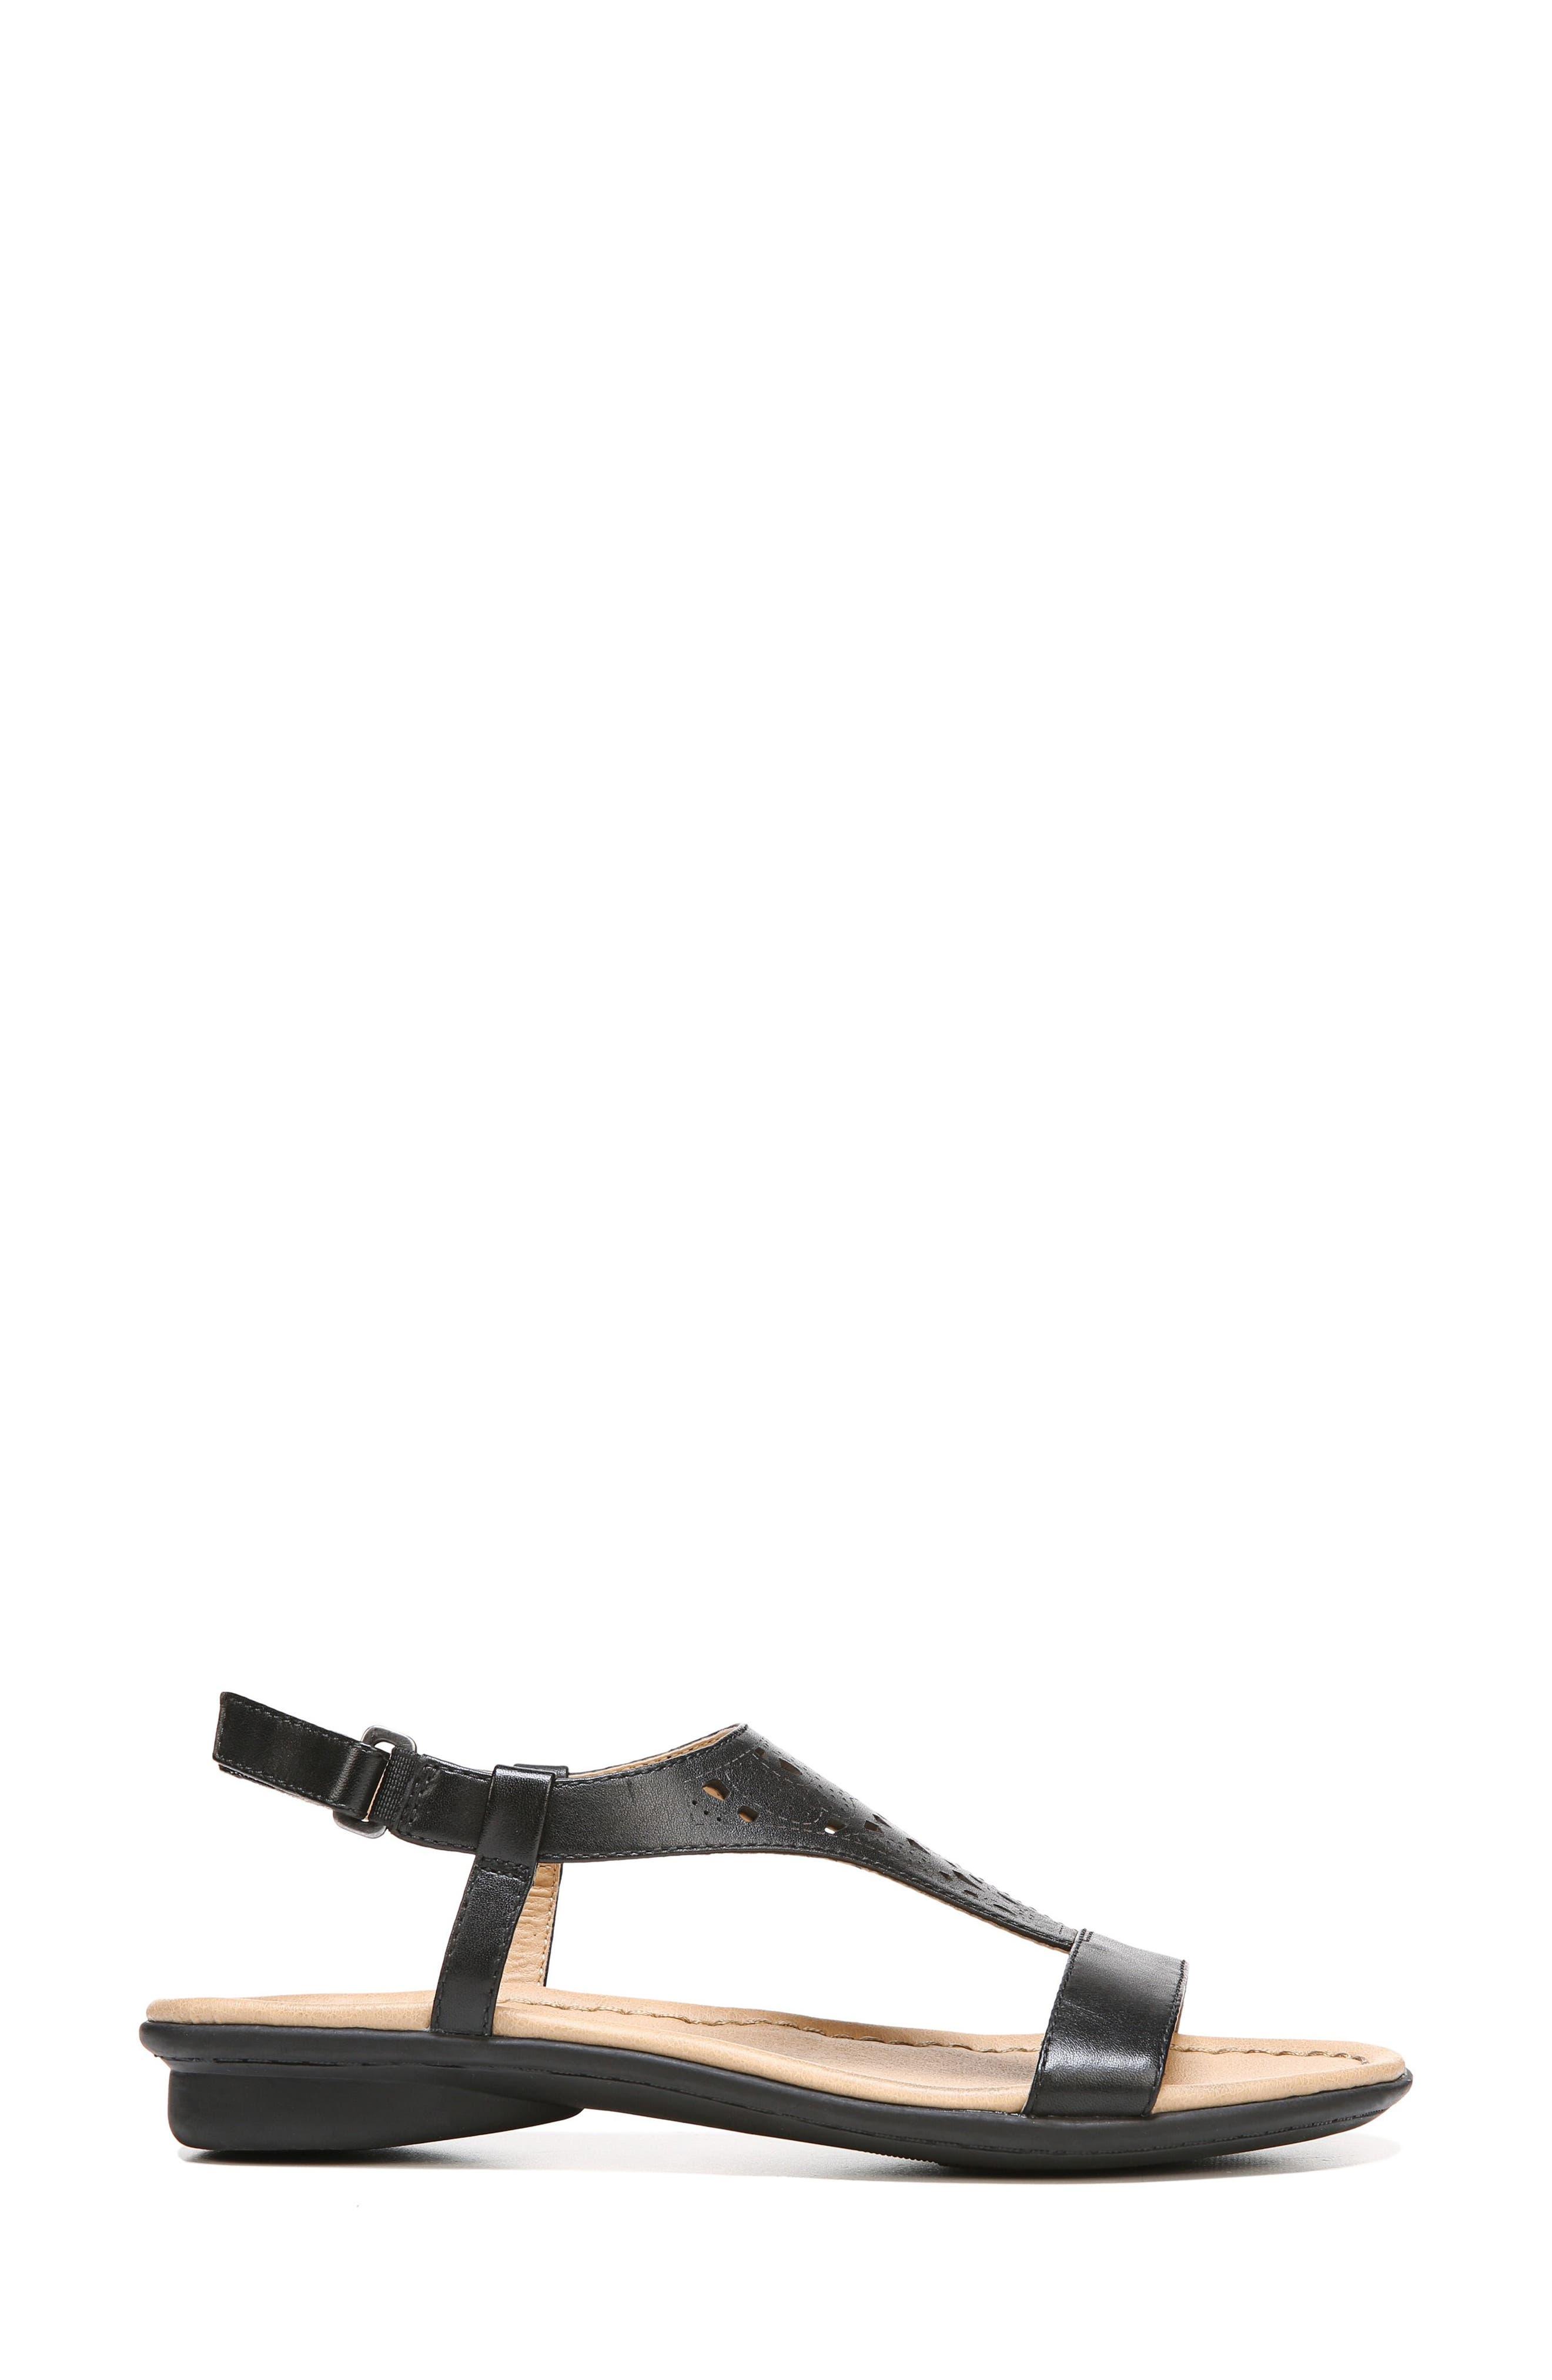 Windham Sandal,                             Alternate thumbnail 3, color,                             BLACK LEATHER